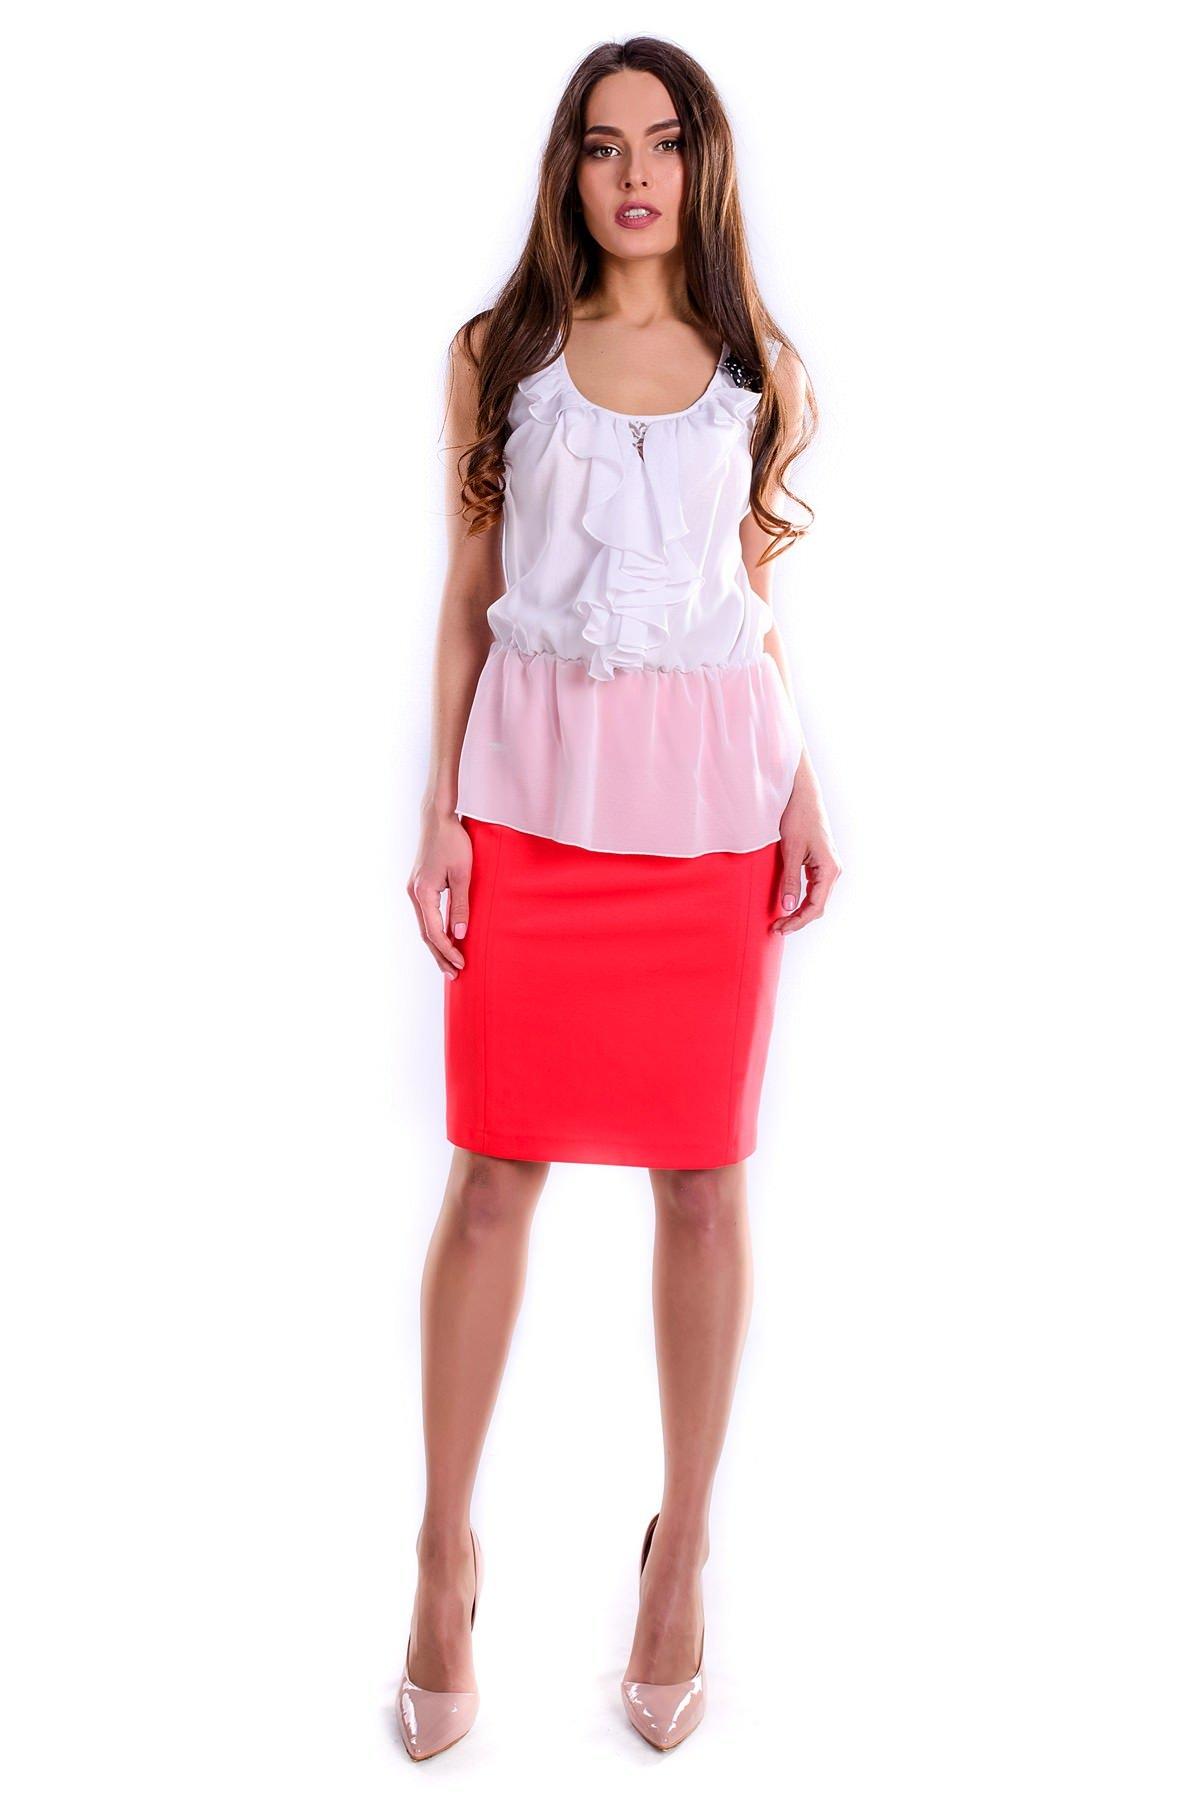 Женские блузки оптом от производителя Блуза Волан рукав